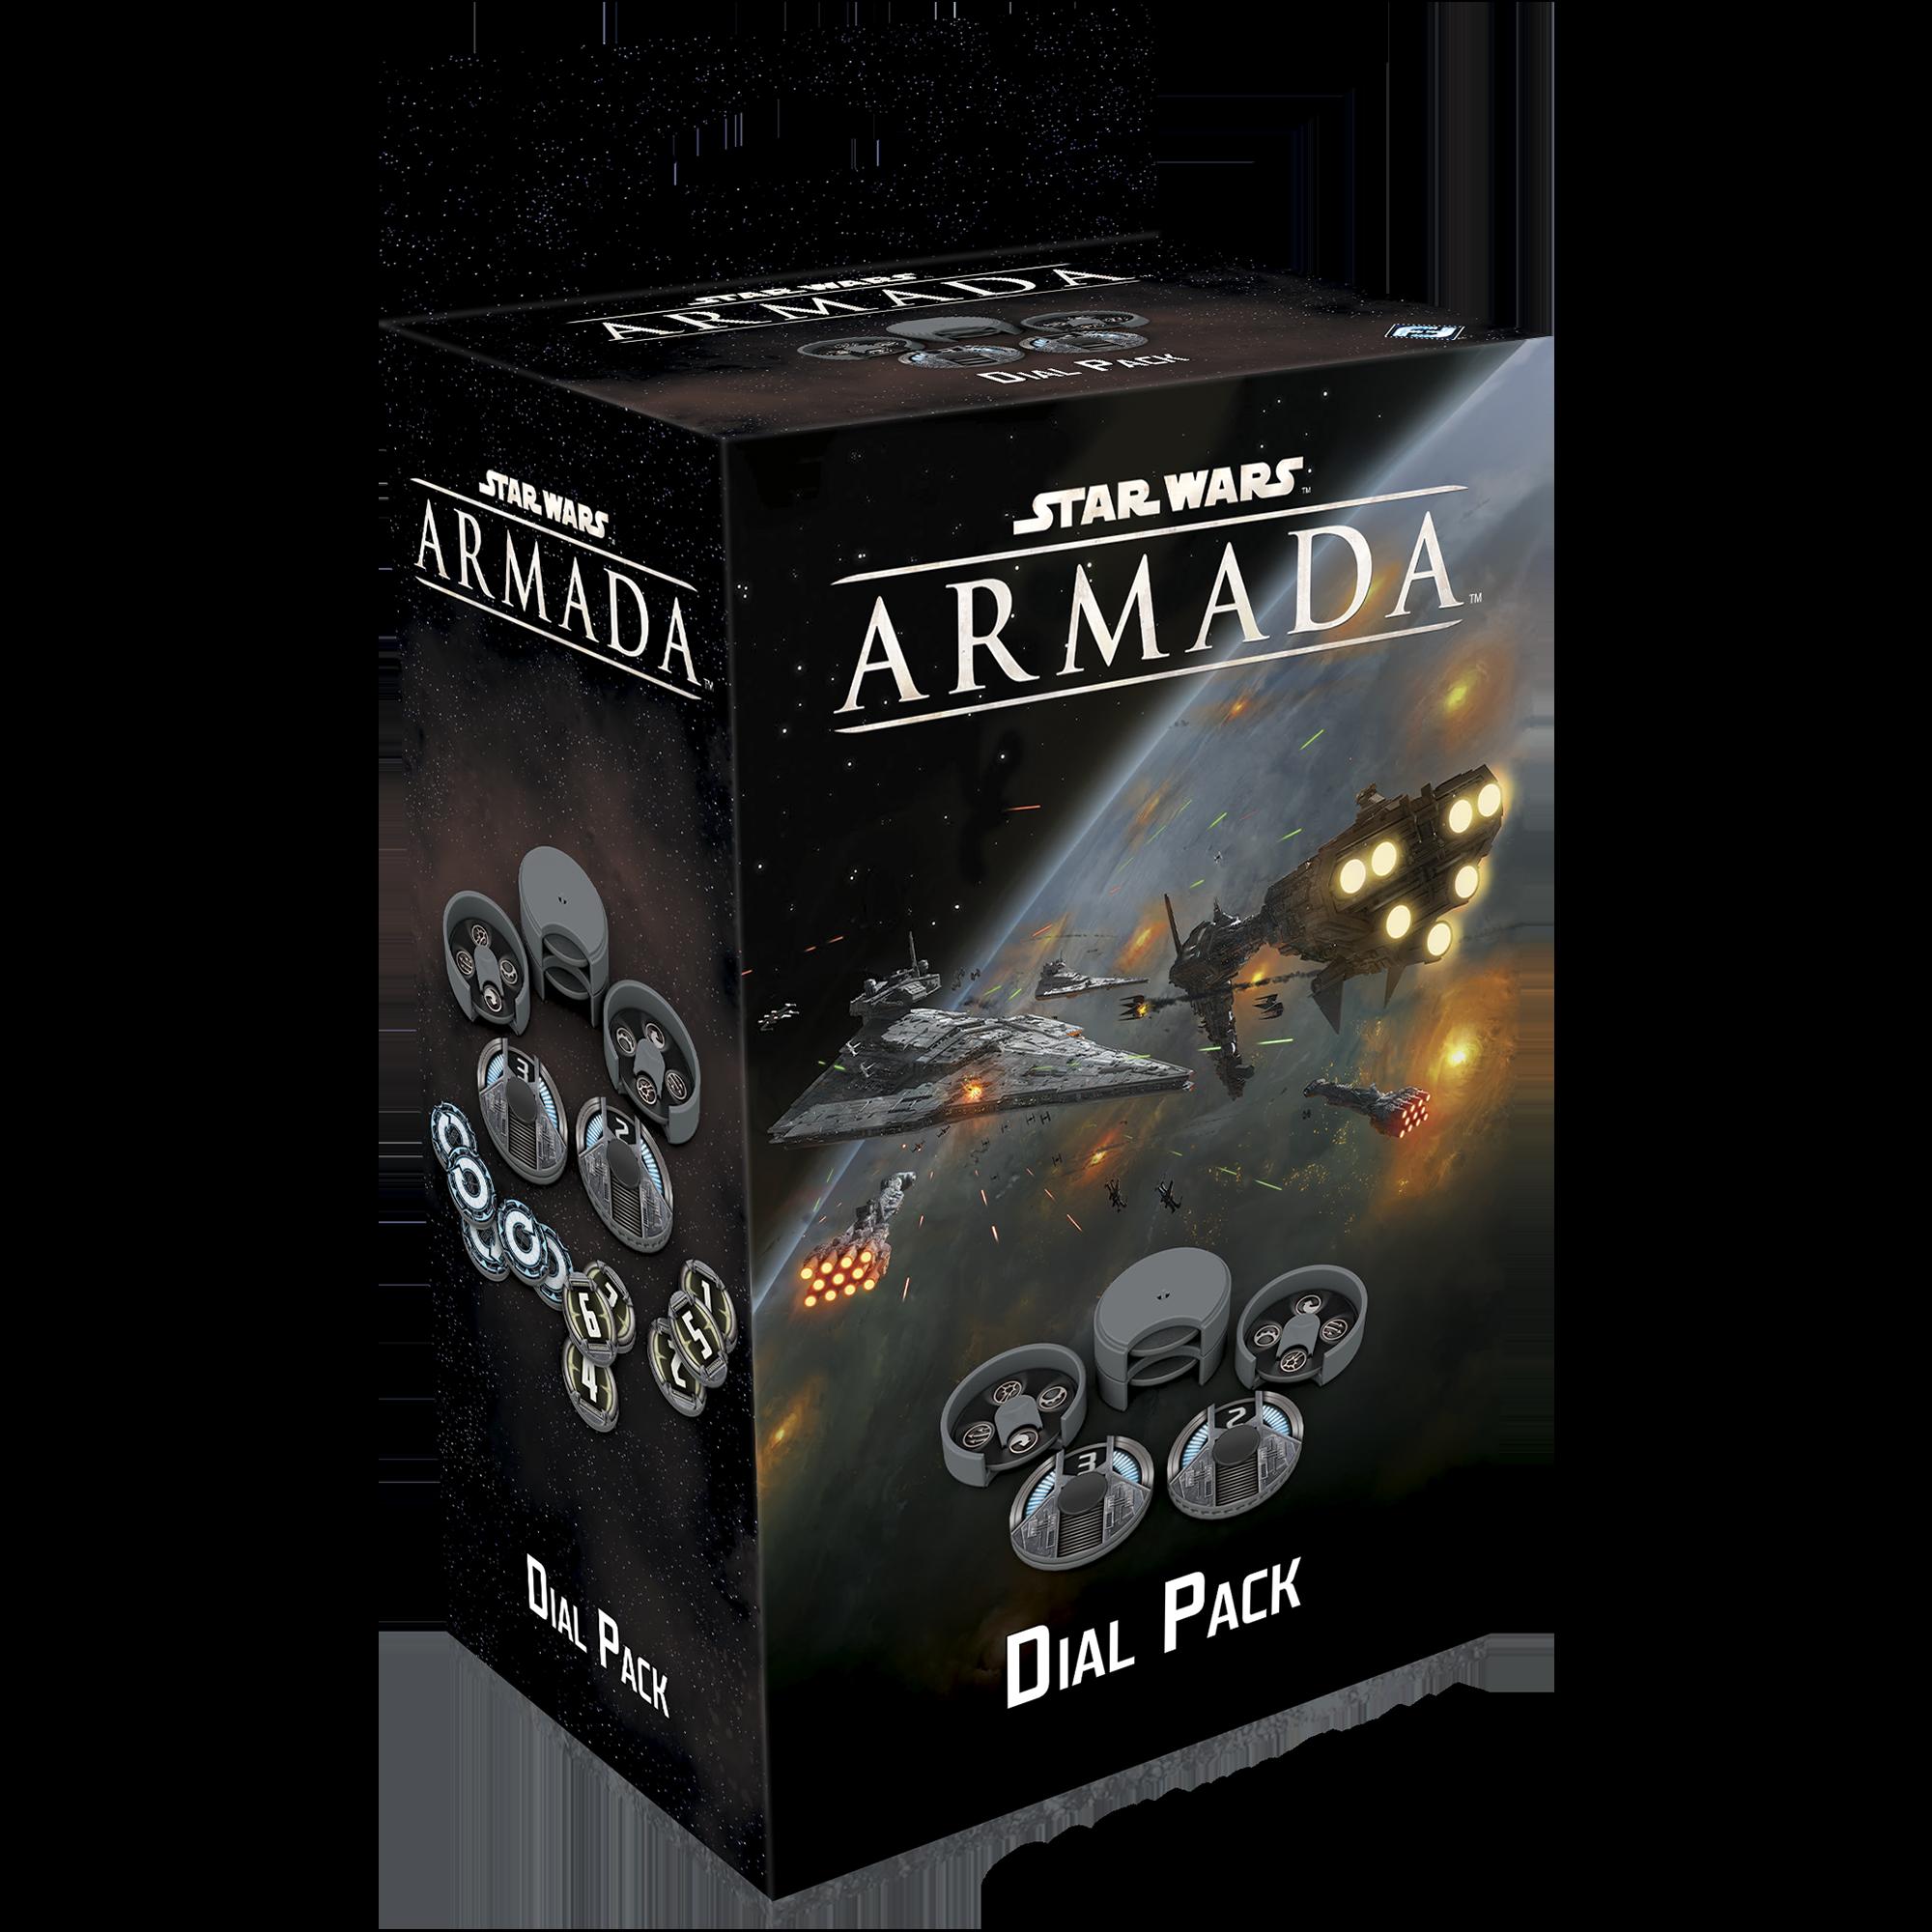 [Armada] Wave IX - Clone Wars Swm39-box-left